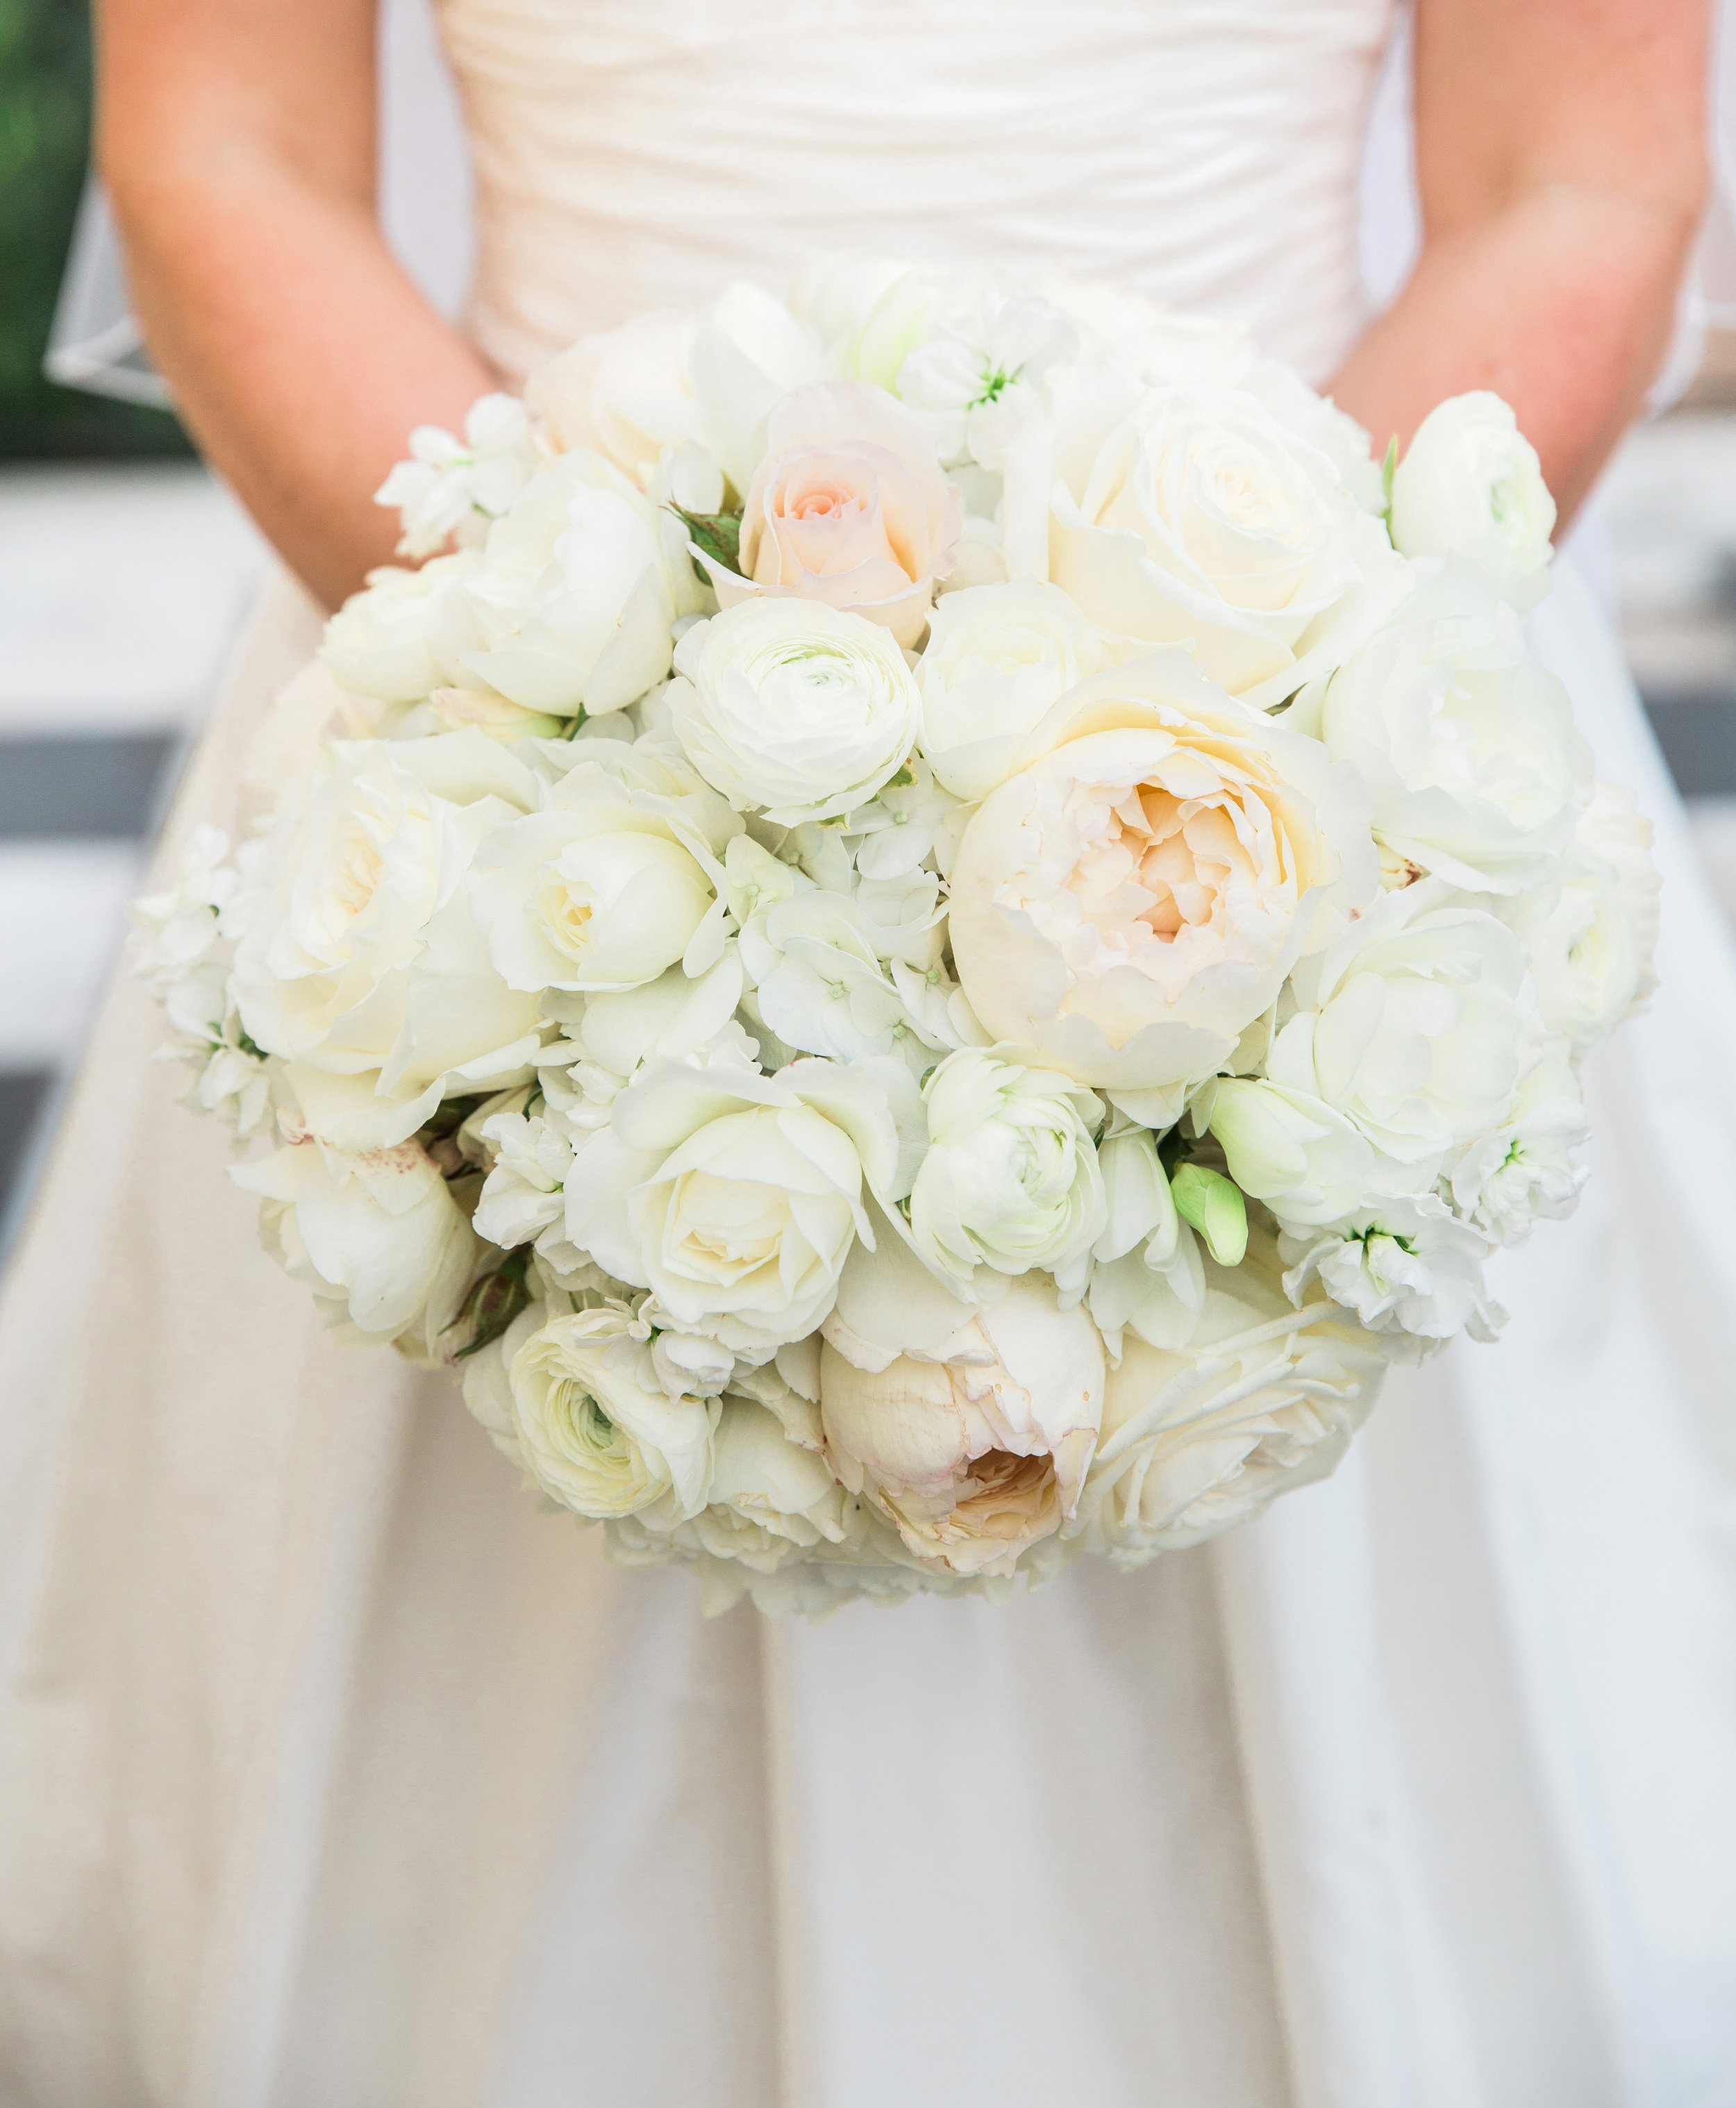 Evergreen-Museum-Balitmore-Maryland-Wedding-Black-Tie-Bride-021.jpg